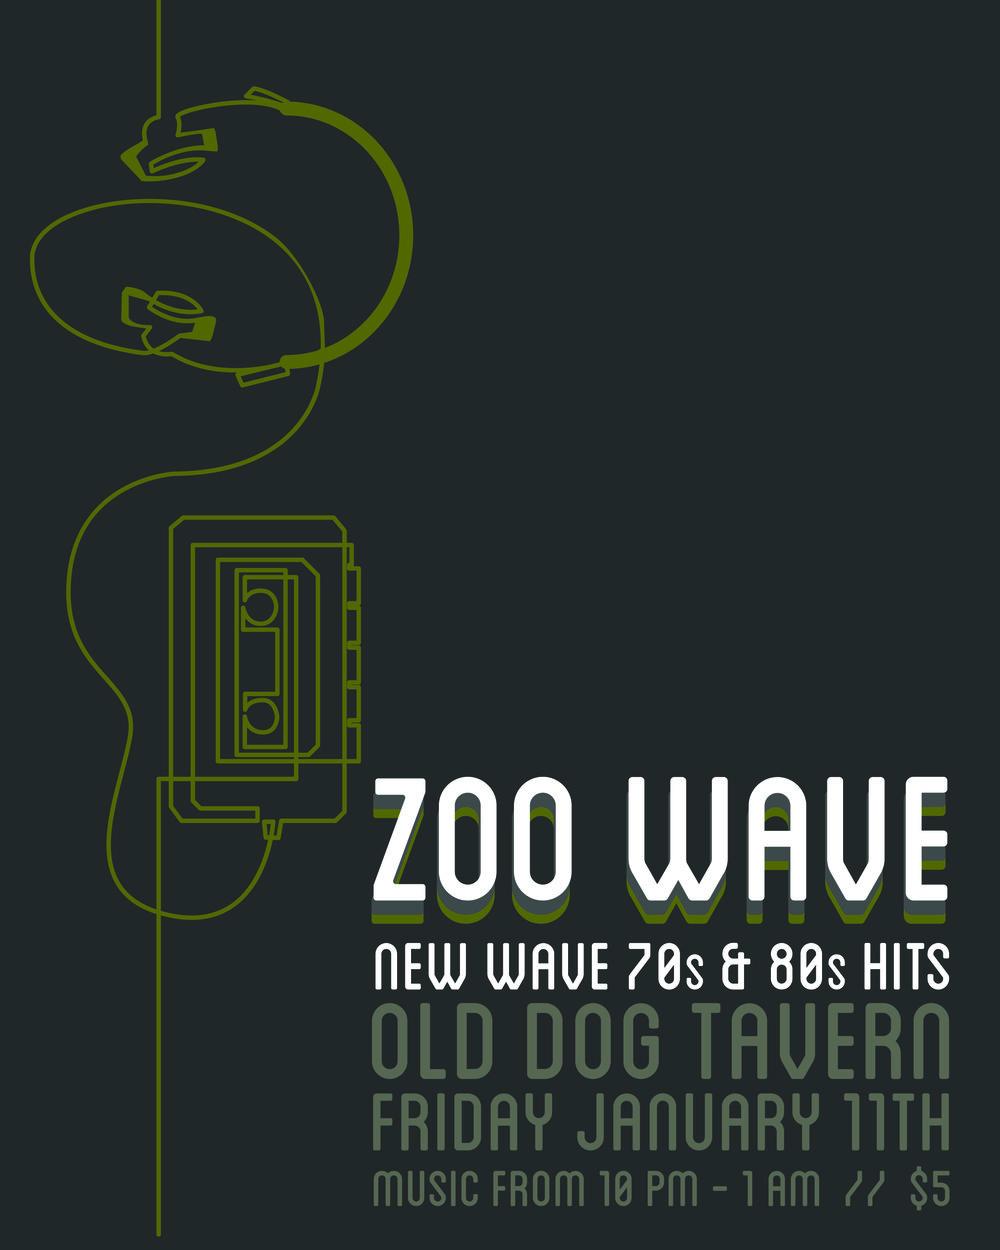 zoowave1_11_2019.jpg